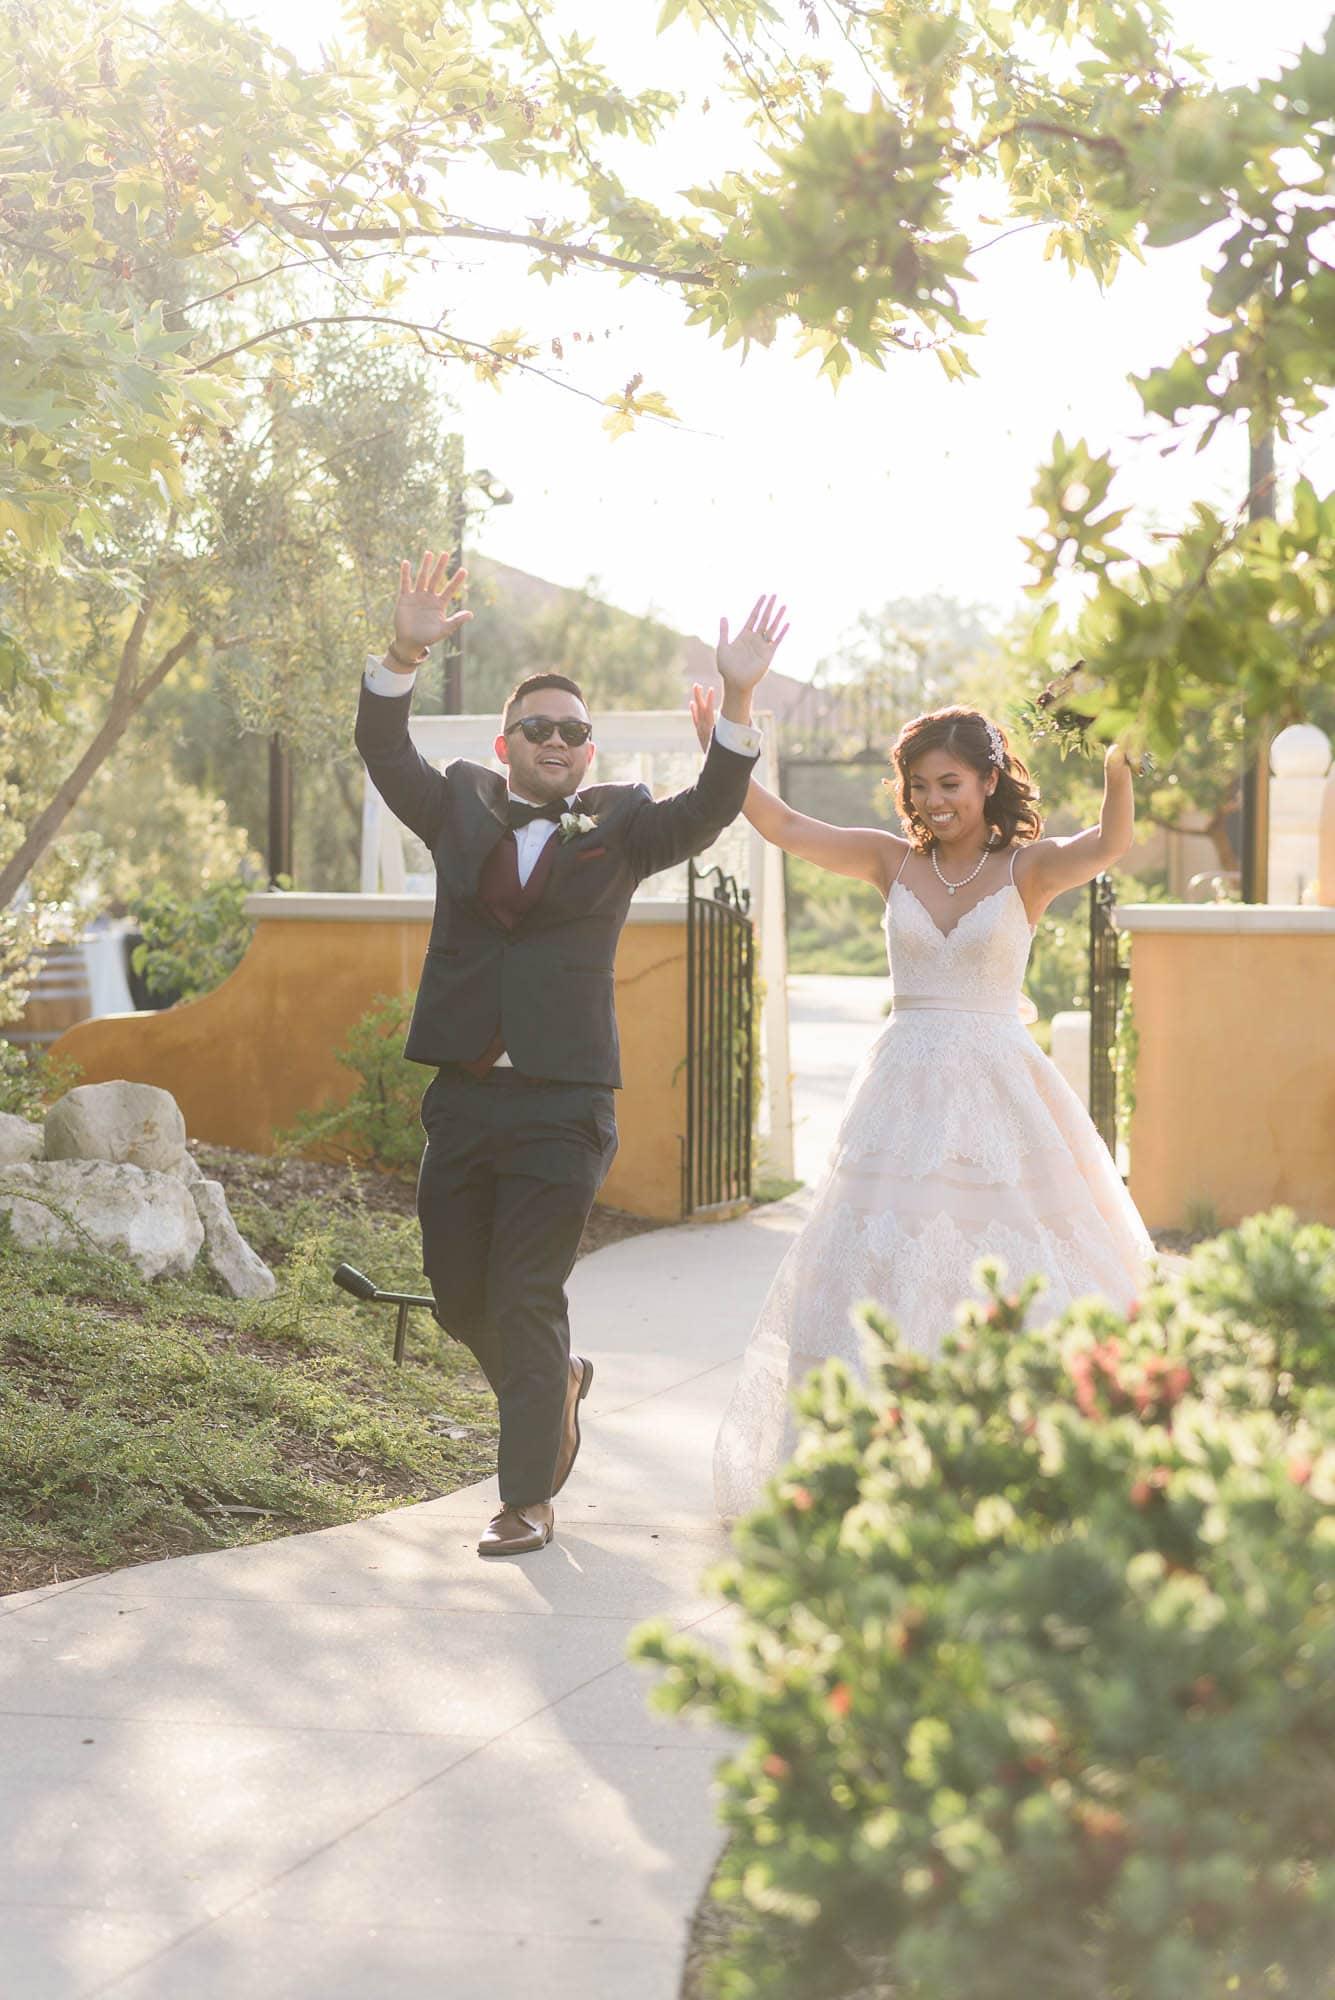 034_Alan_and_Heidi_Wedding_Karla_Paolo